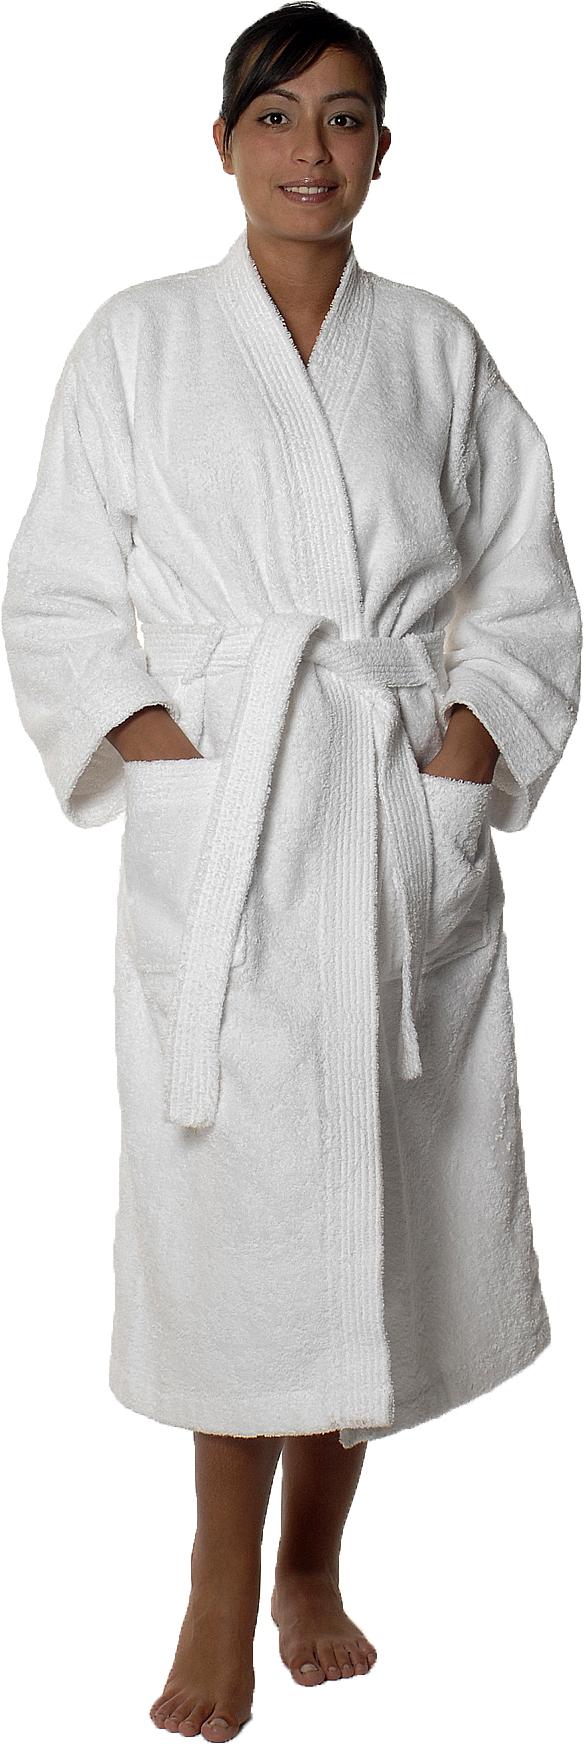 Peignoir col kimono en Coton couleur Blanc Taille L (Blanc)